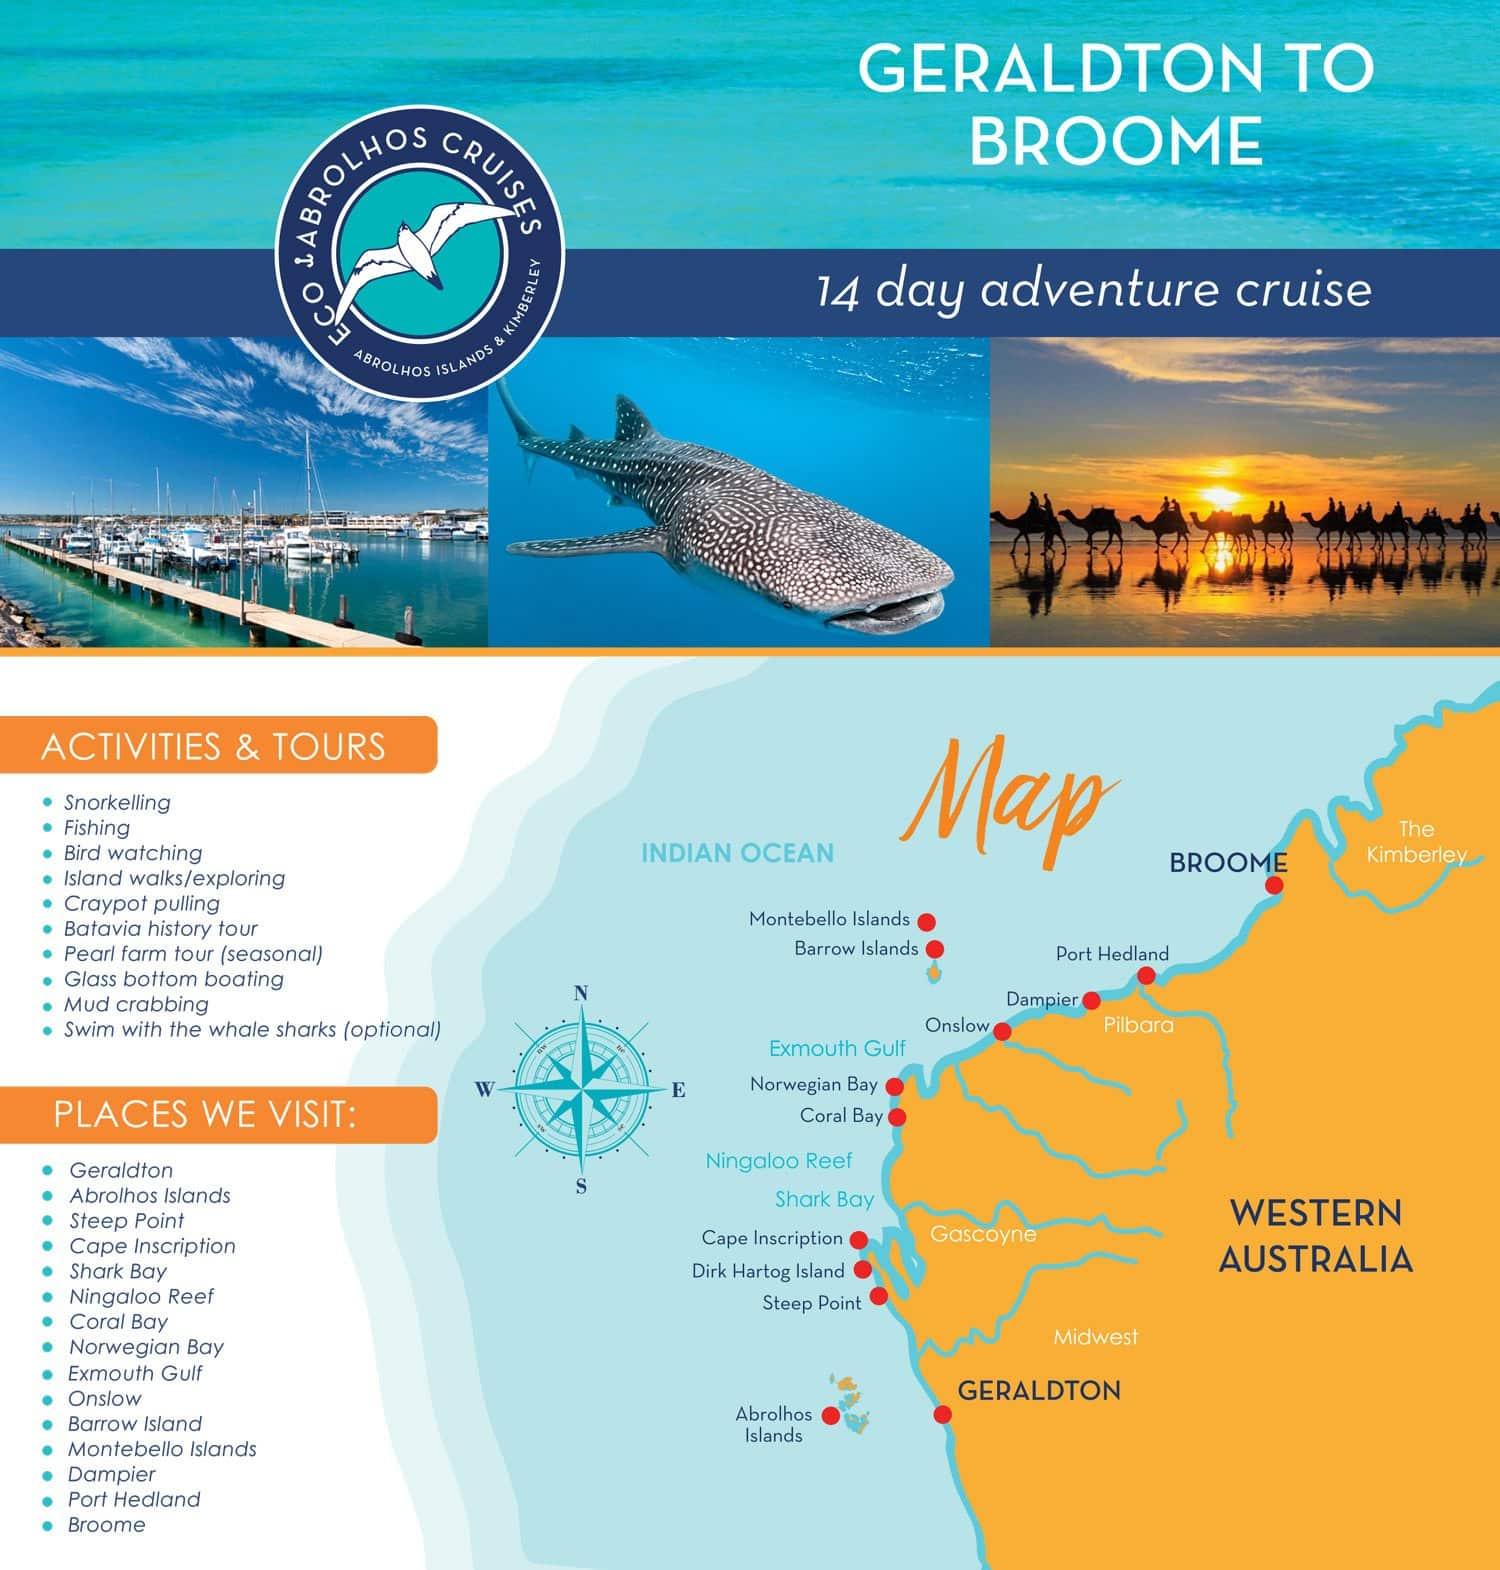 Geraldton to Broome adventure Cruise